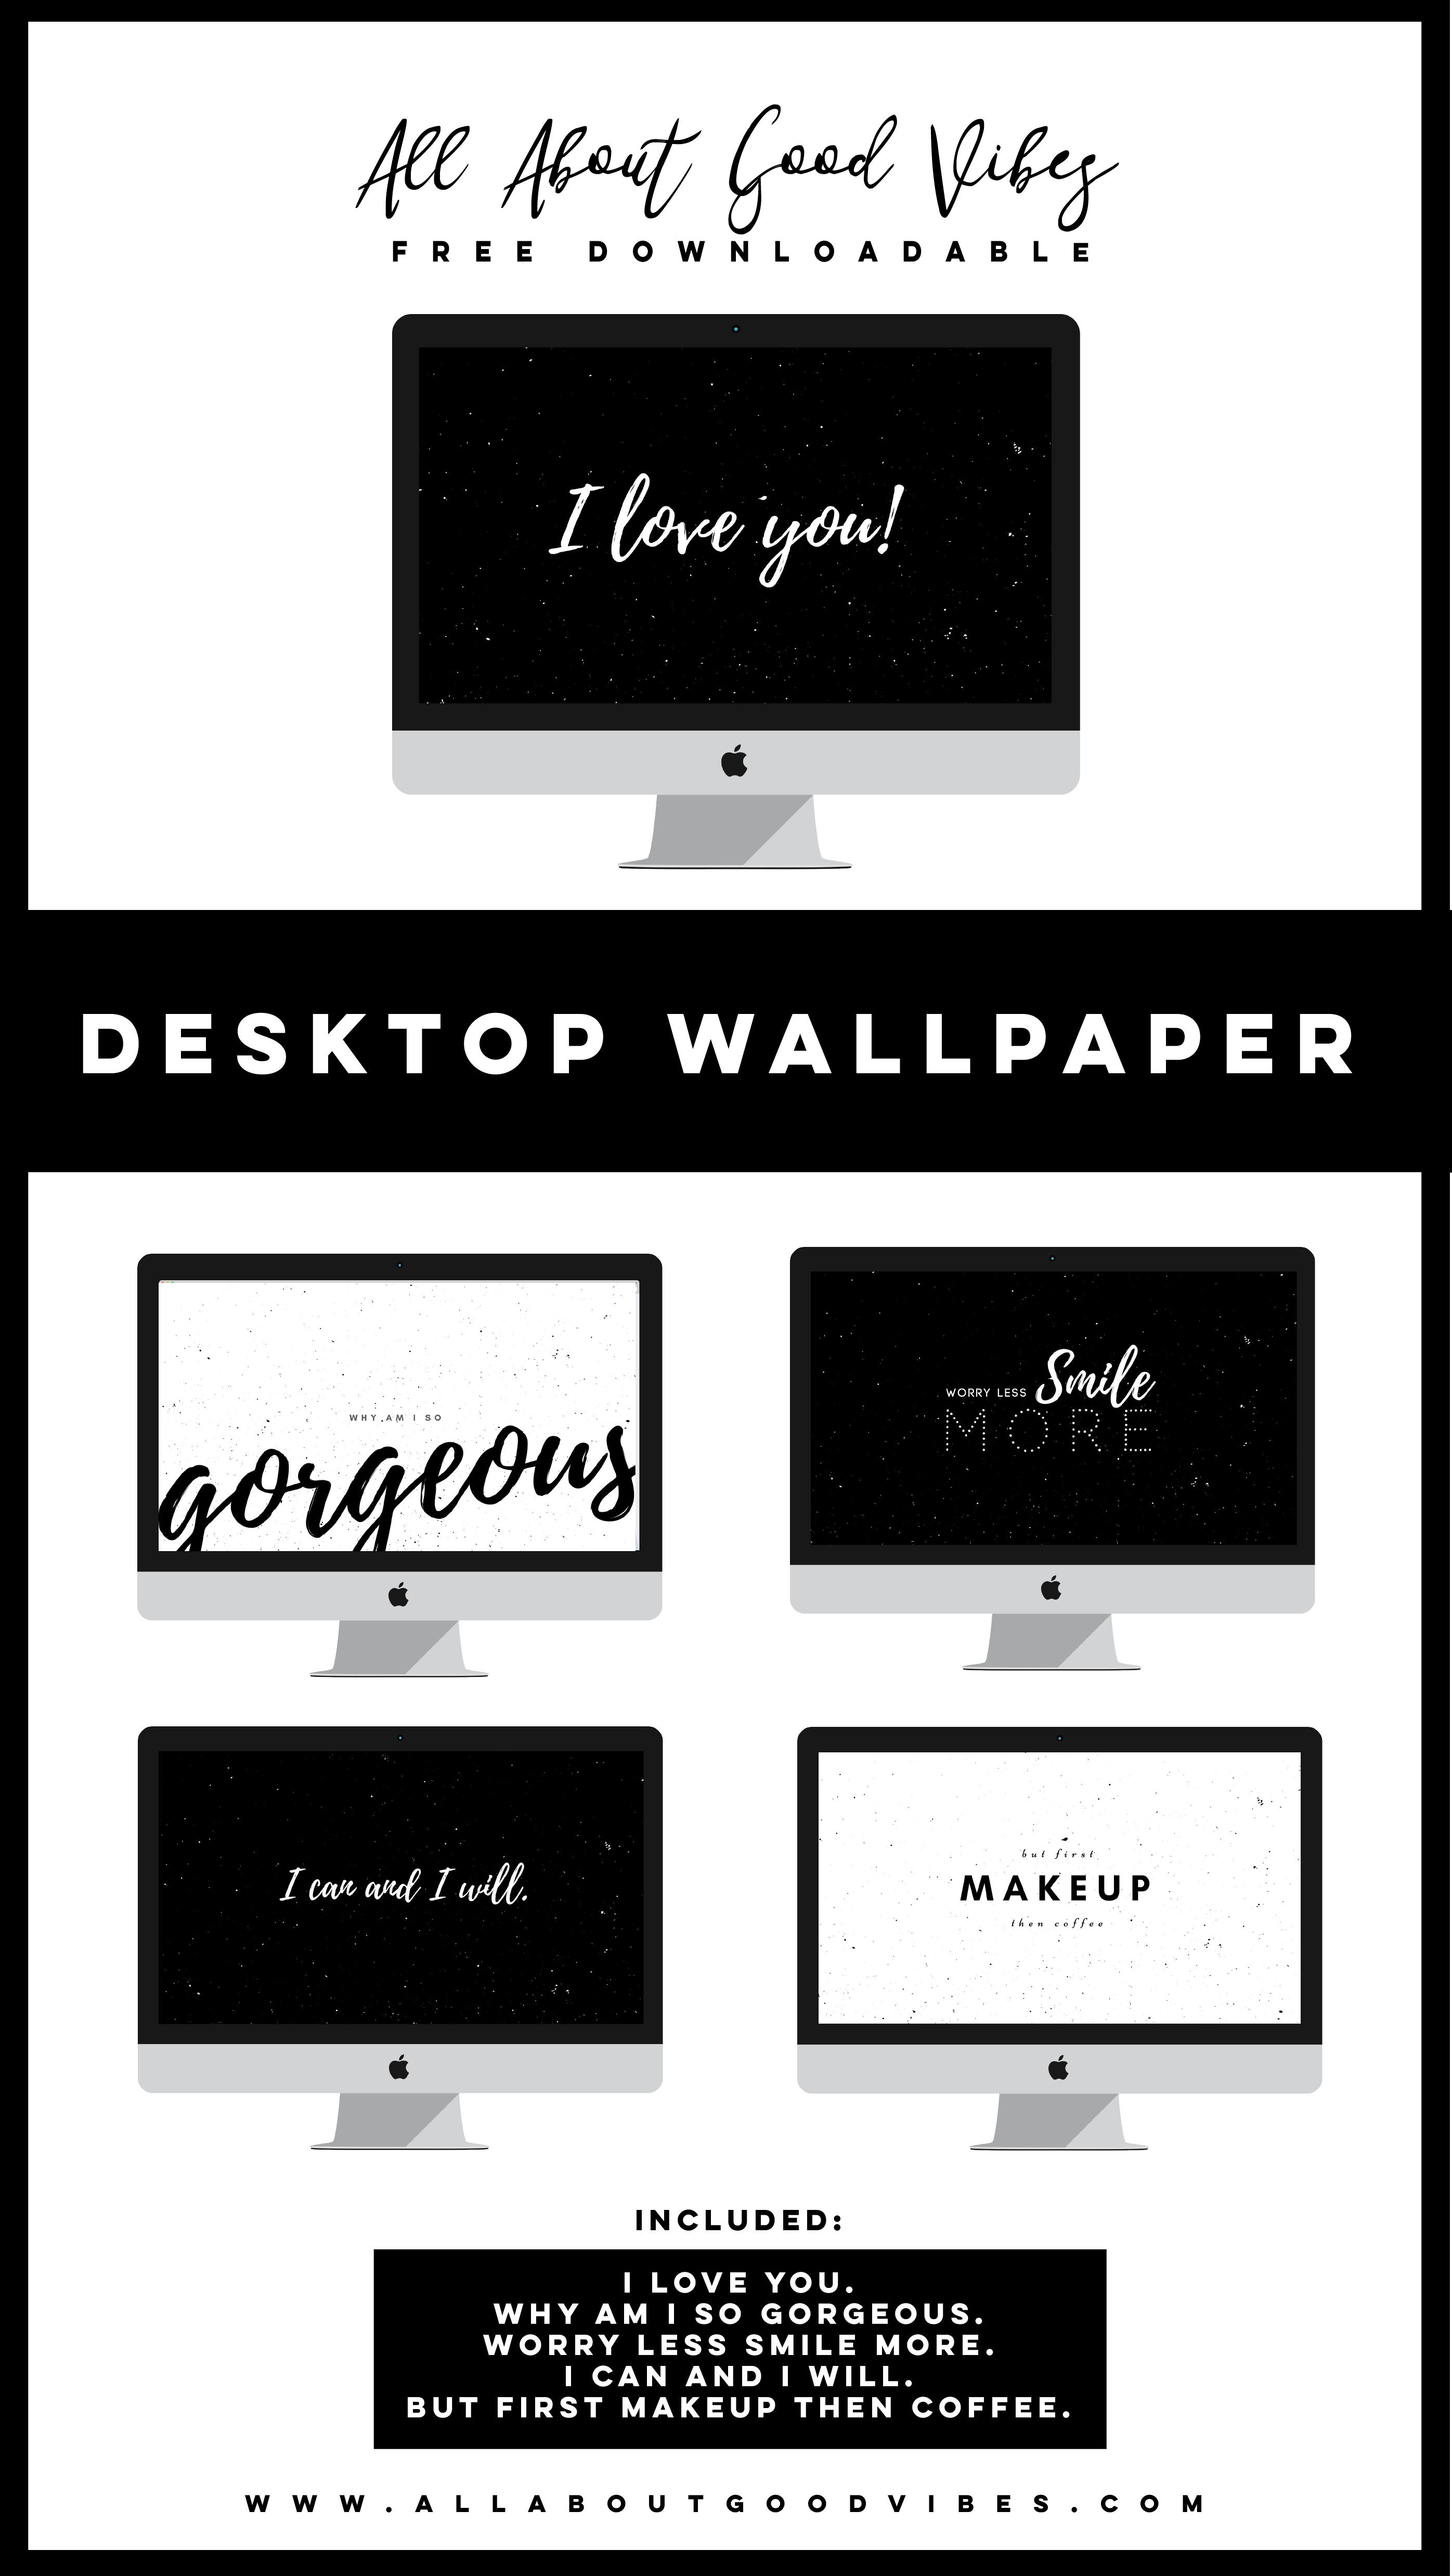 Free Downloadable Black And White Desktop Wallpaper Desktop Wallpaper Design Computer Wallpaper Desktop Wallpapers Desktop Wallpaper Black